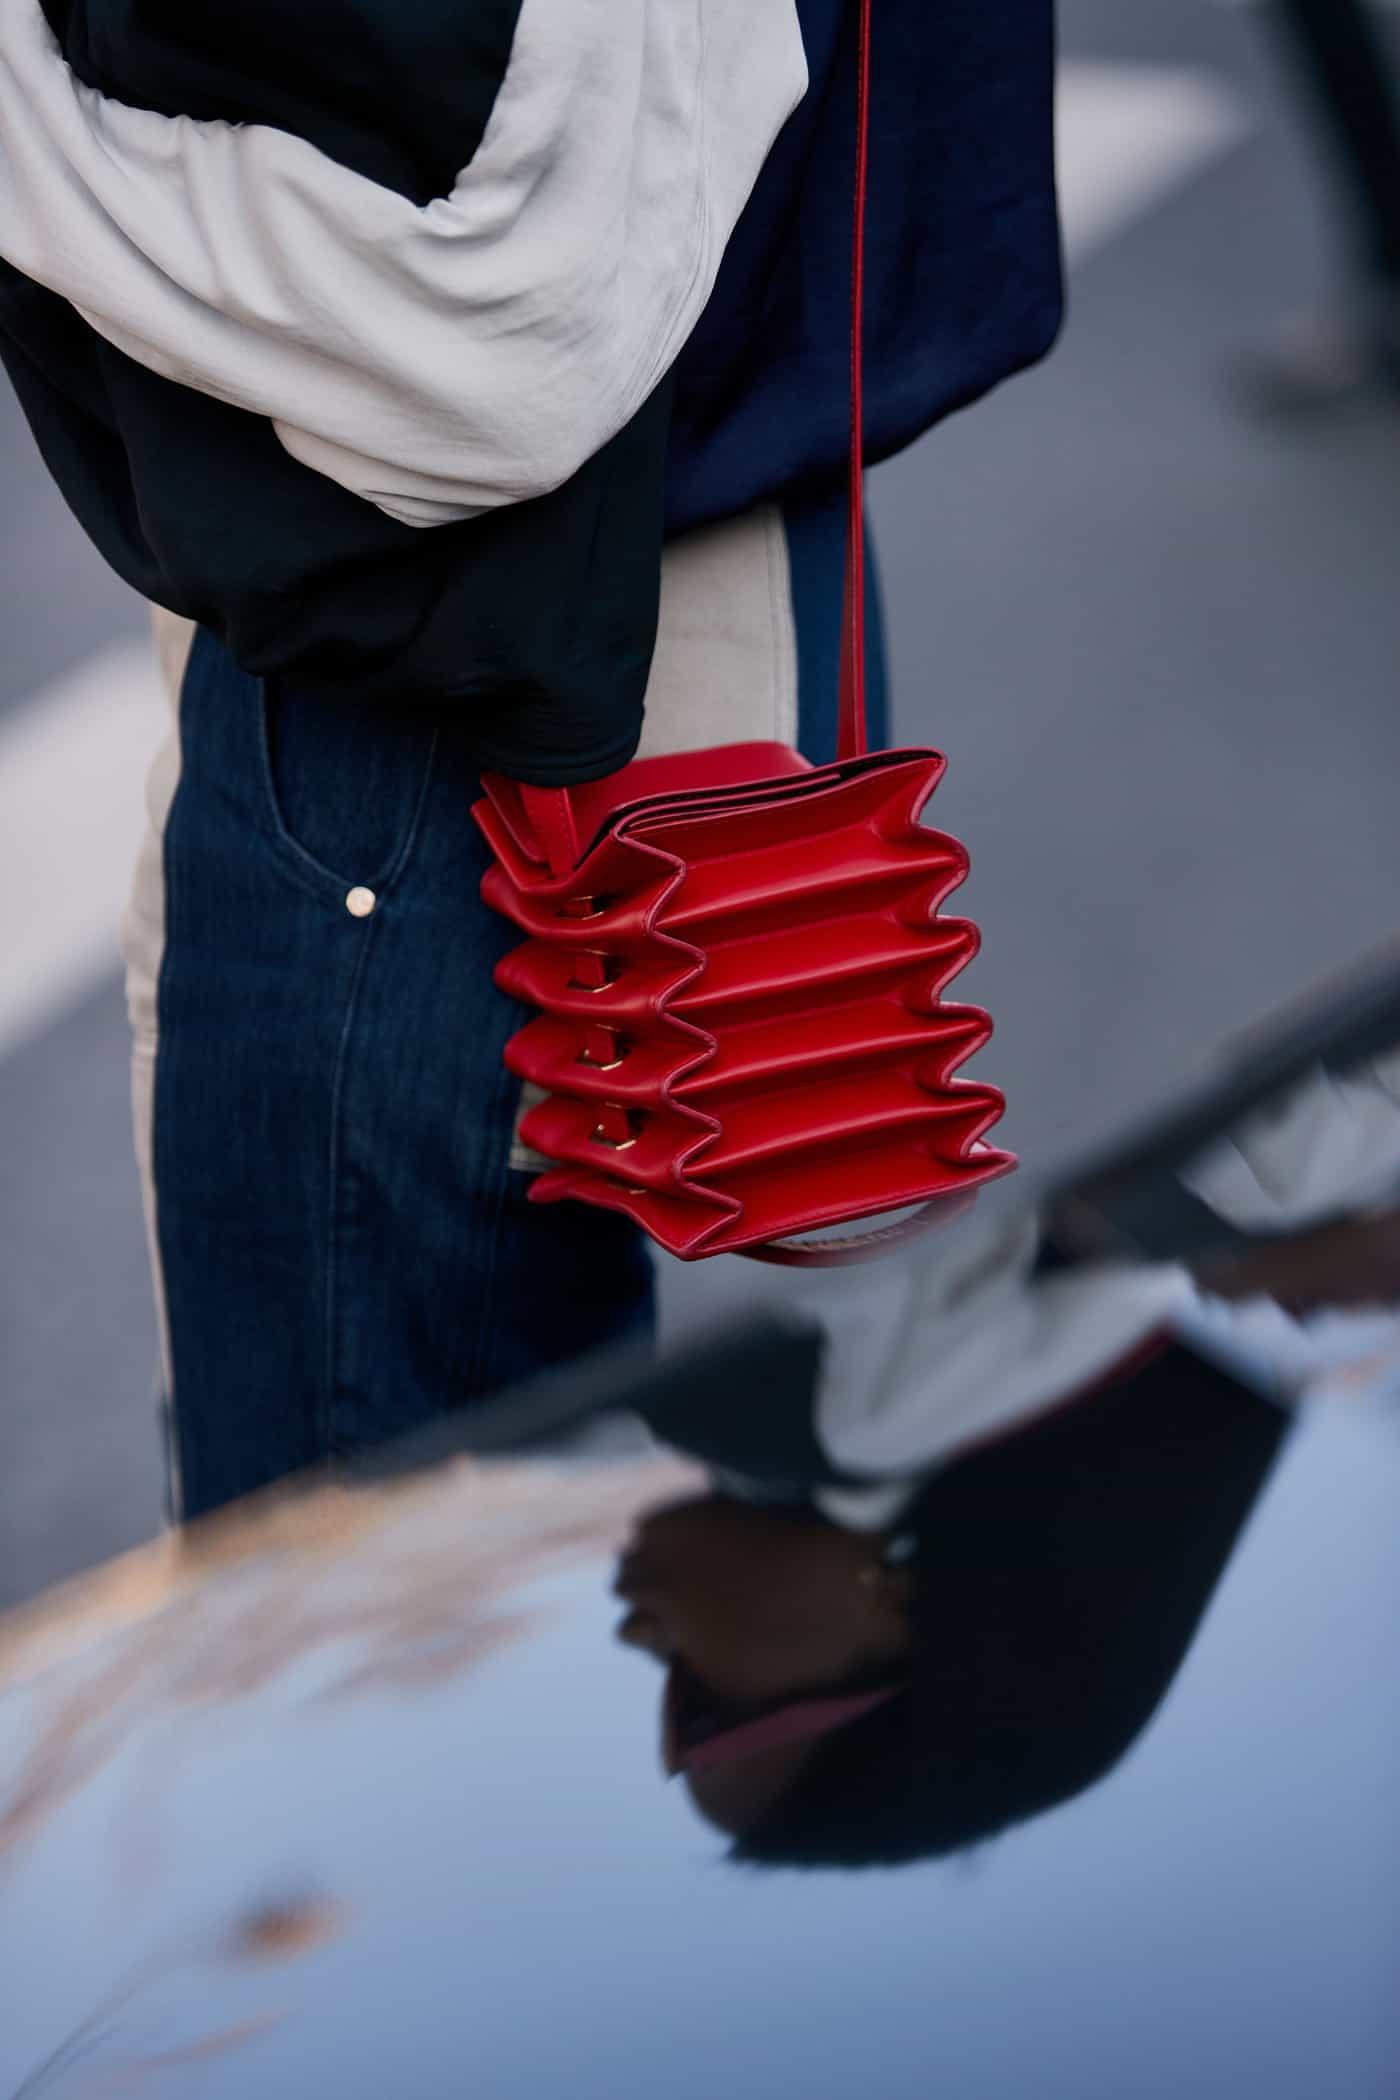 Y/Project's Accordion Bag Source:  fashionweekdaily.com